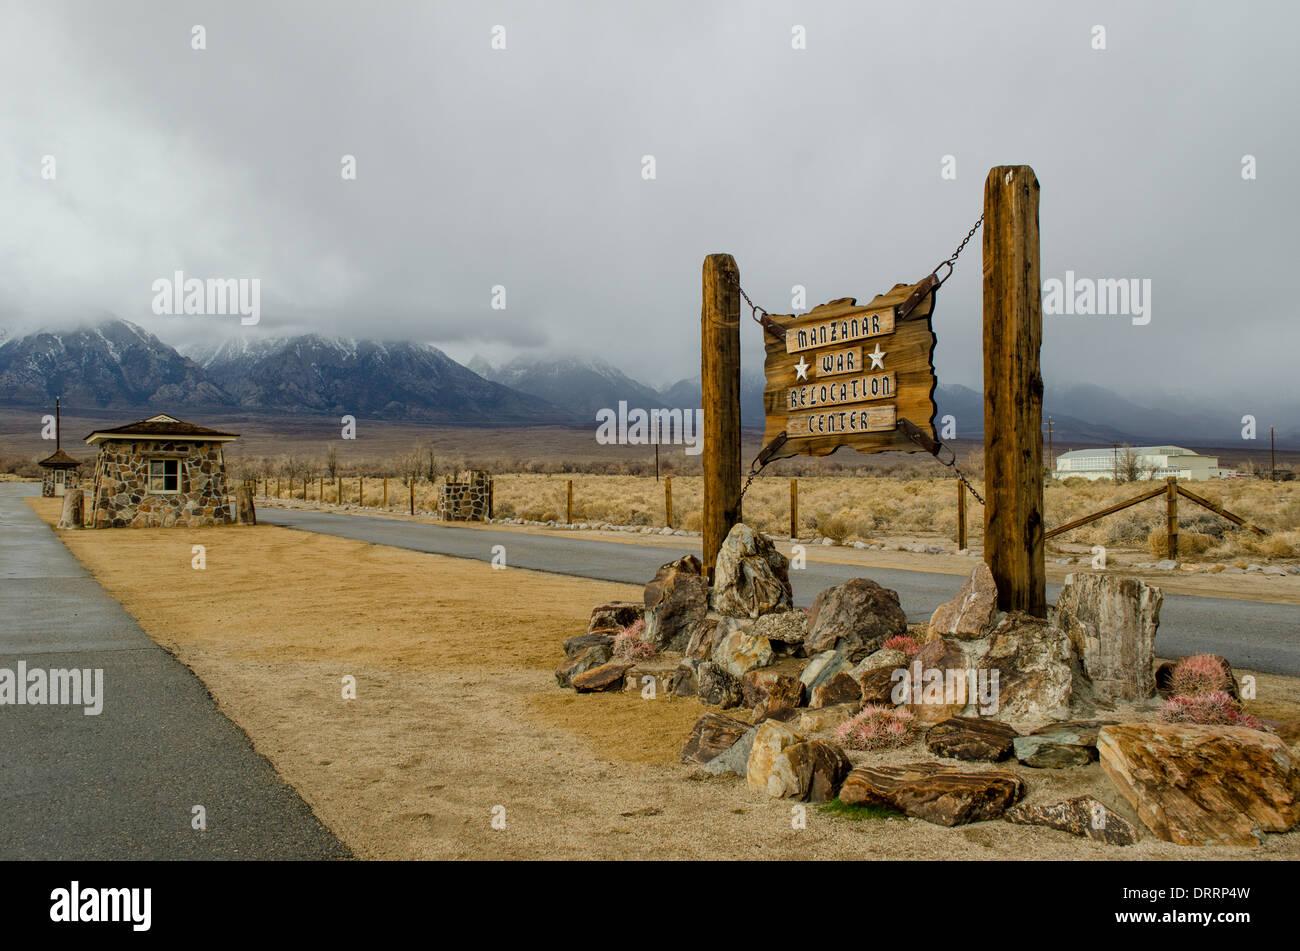 Manzanar  is a WW2 era prison camp that held Japanese Americans located in a remote desert region near Lone Pine, California - Stock Image